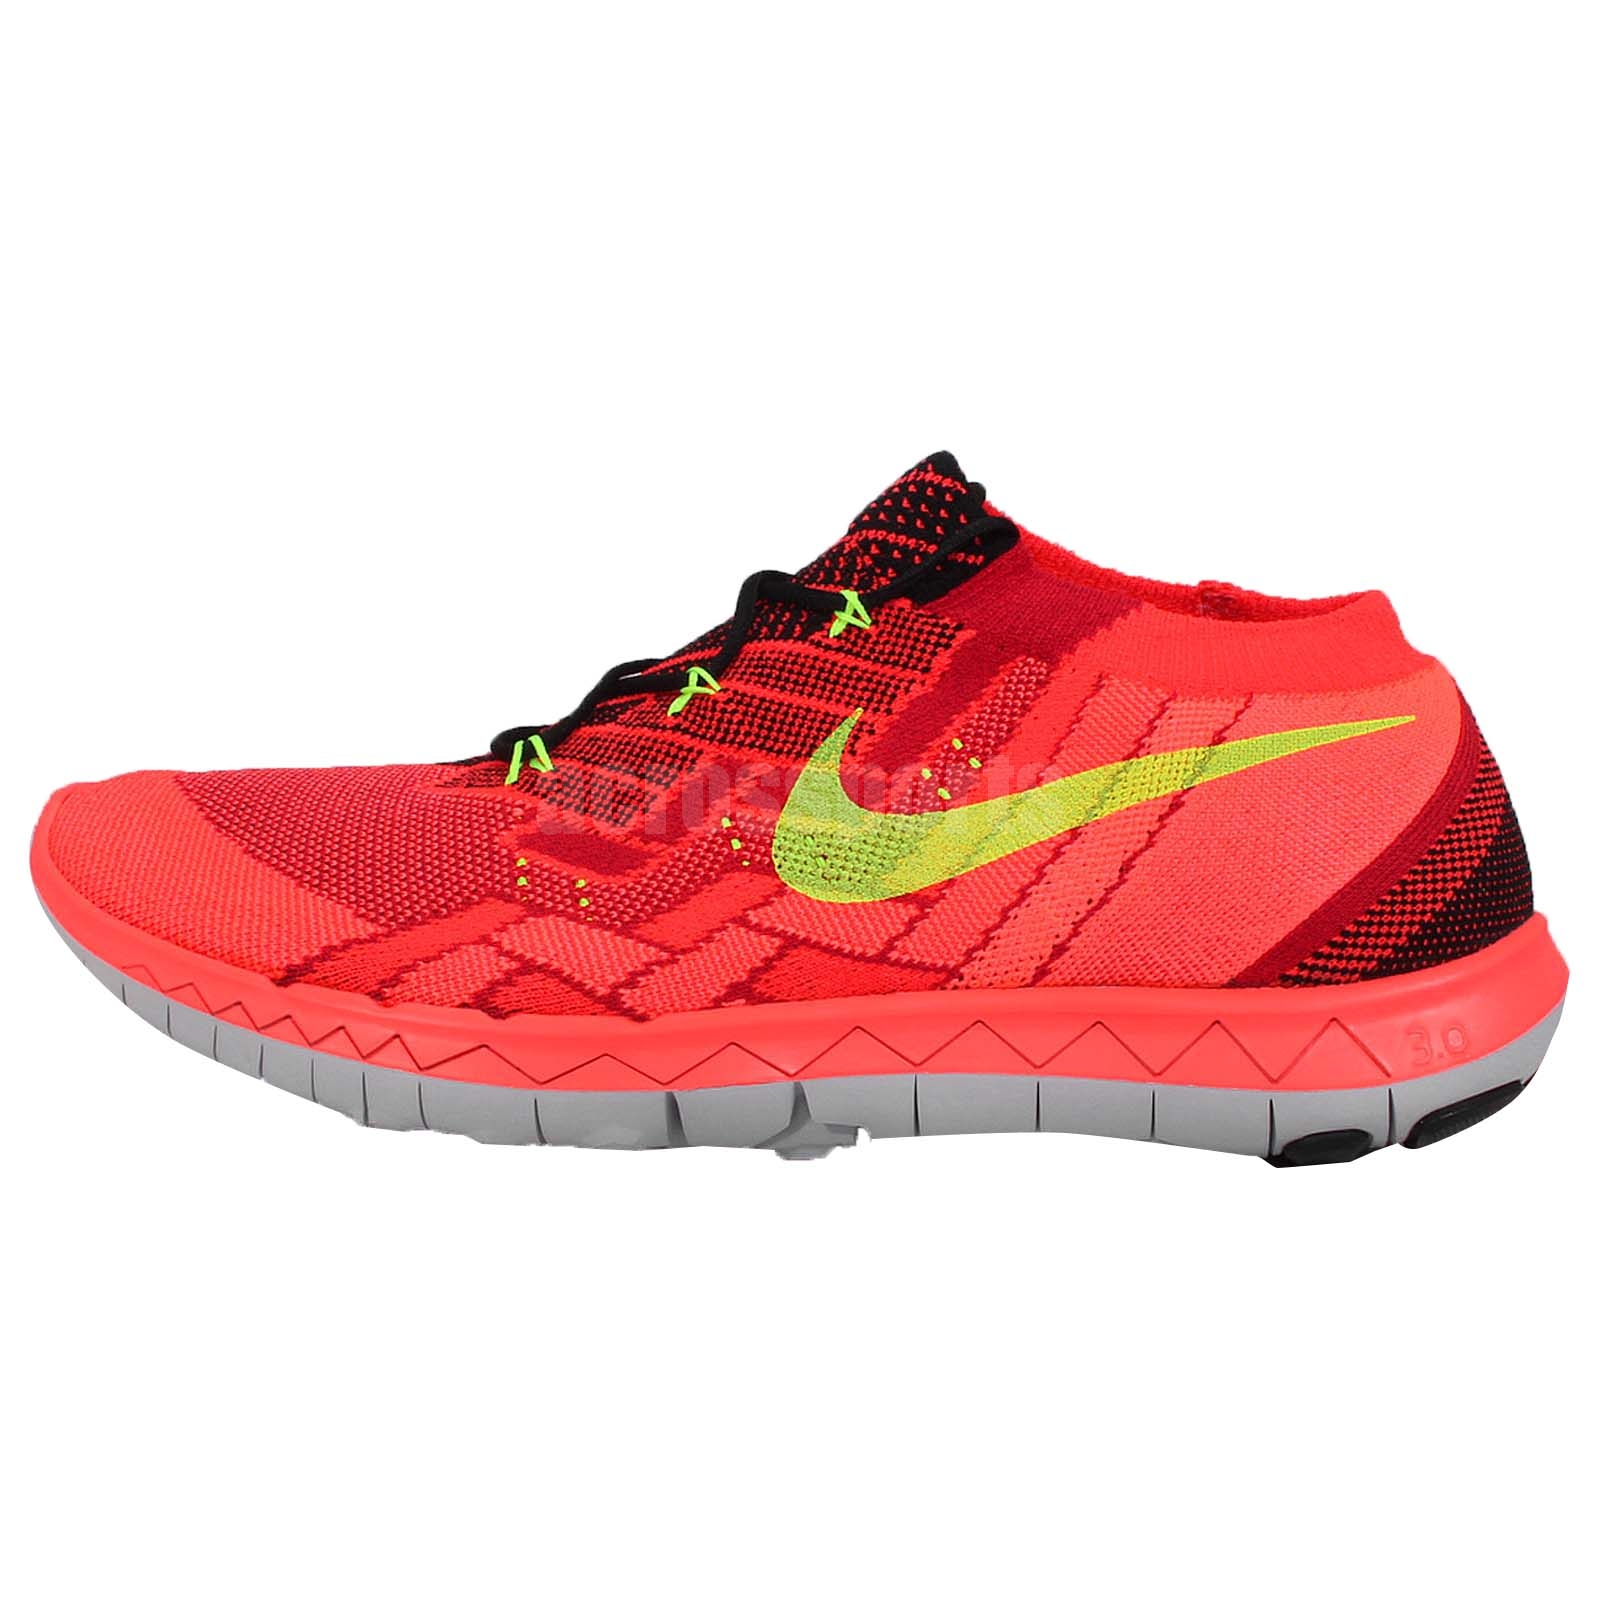 Nike Free 3.0 Flyknit Red Crimson Mens Running Shoes Nike ...